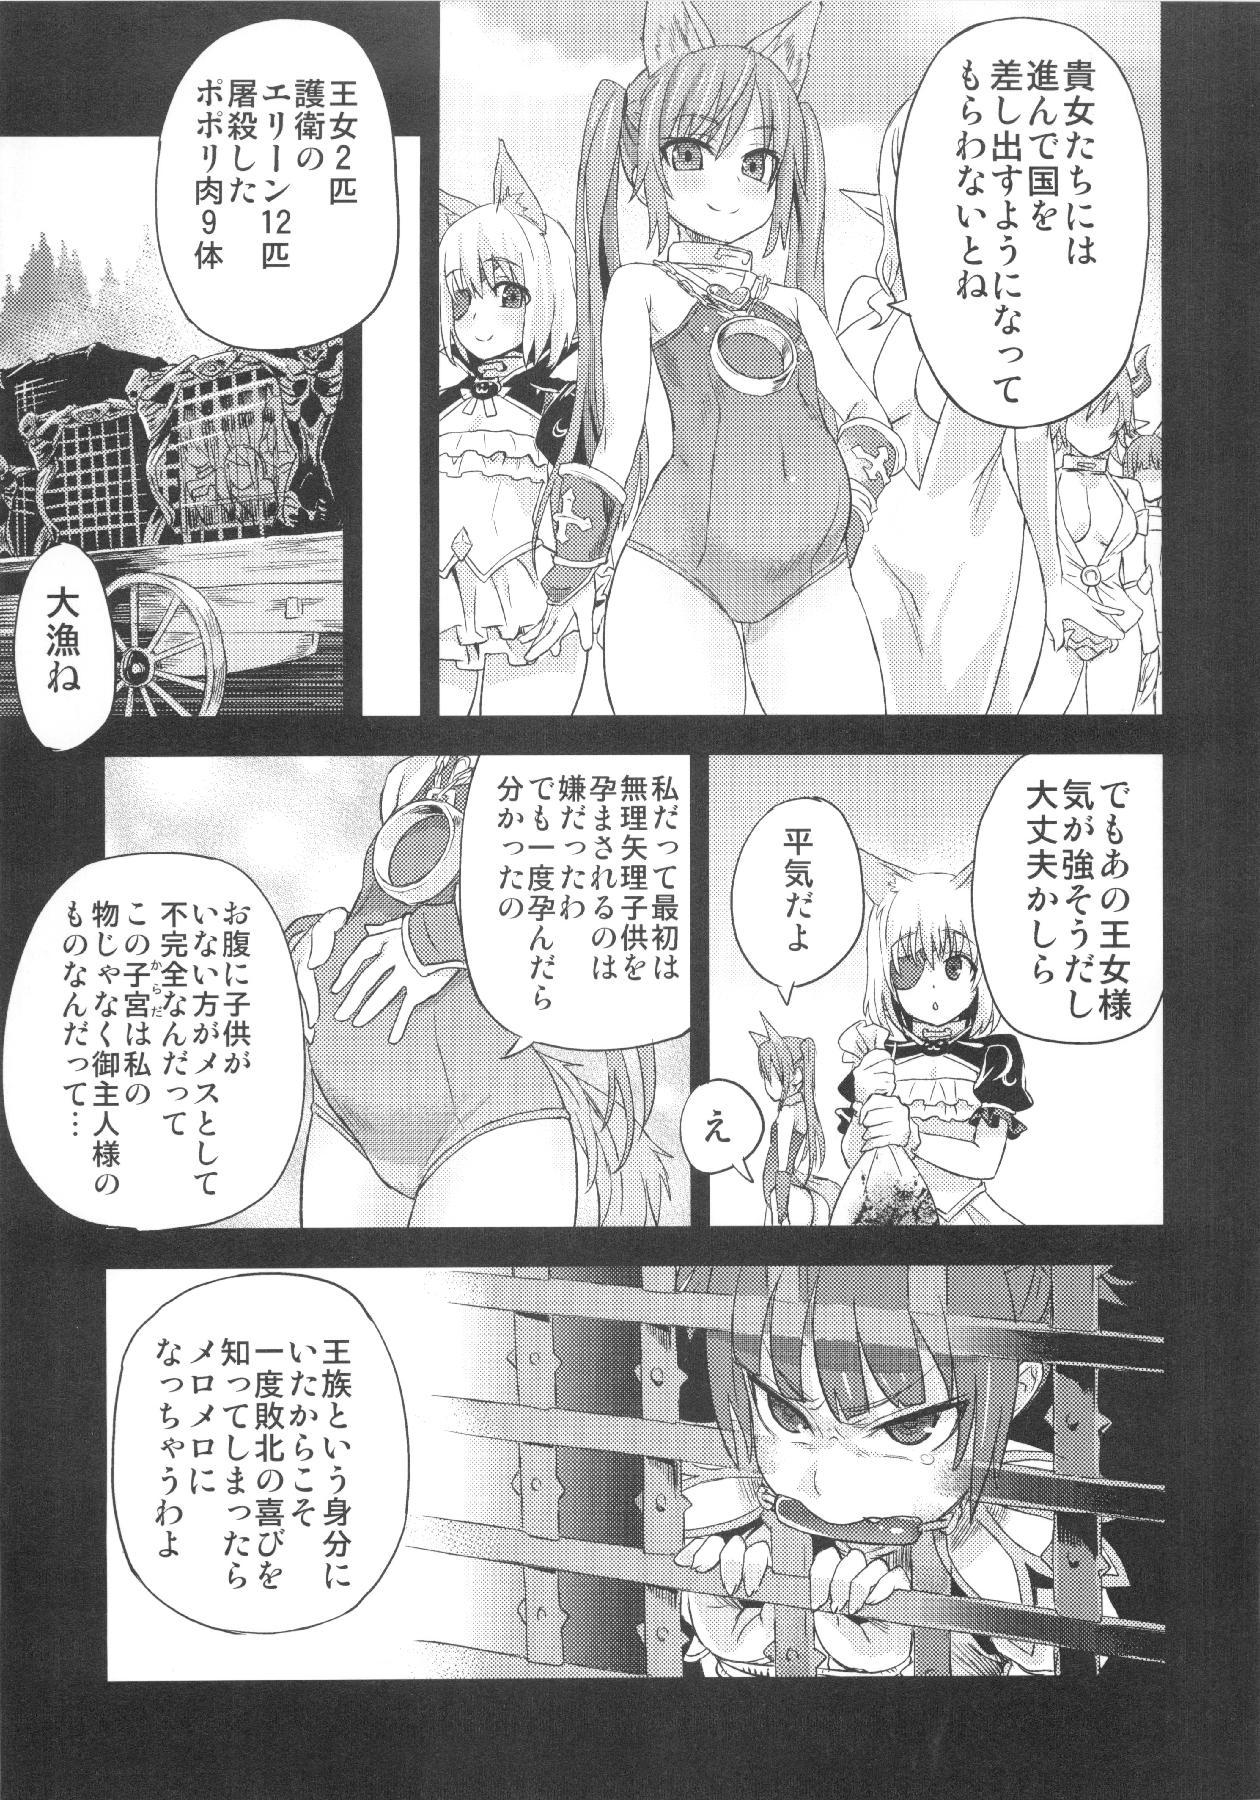 (C83) [Fatalpulse (Asanagi)] VictimGirls Compiled Vol.1 -Victimgirls Soushuuhen 1- MMO Game Selection (Various) 179